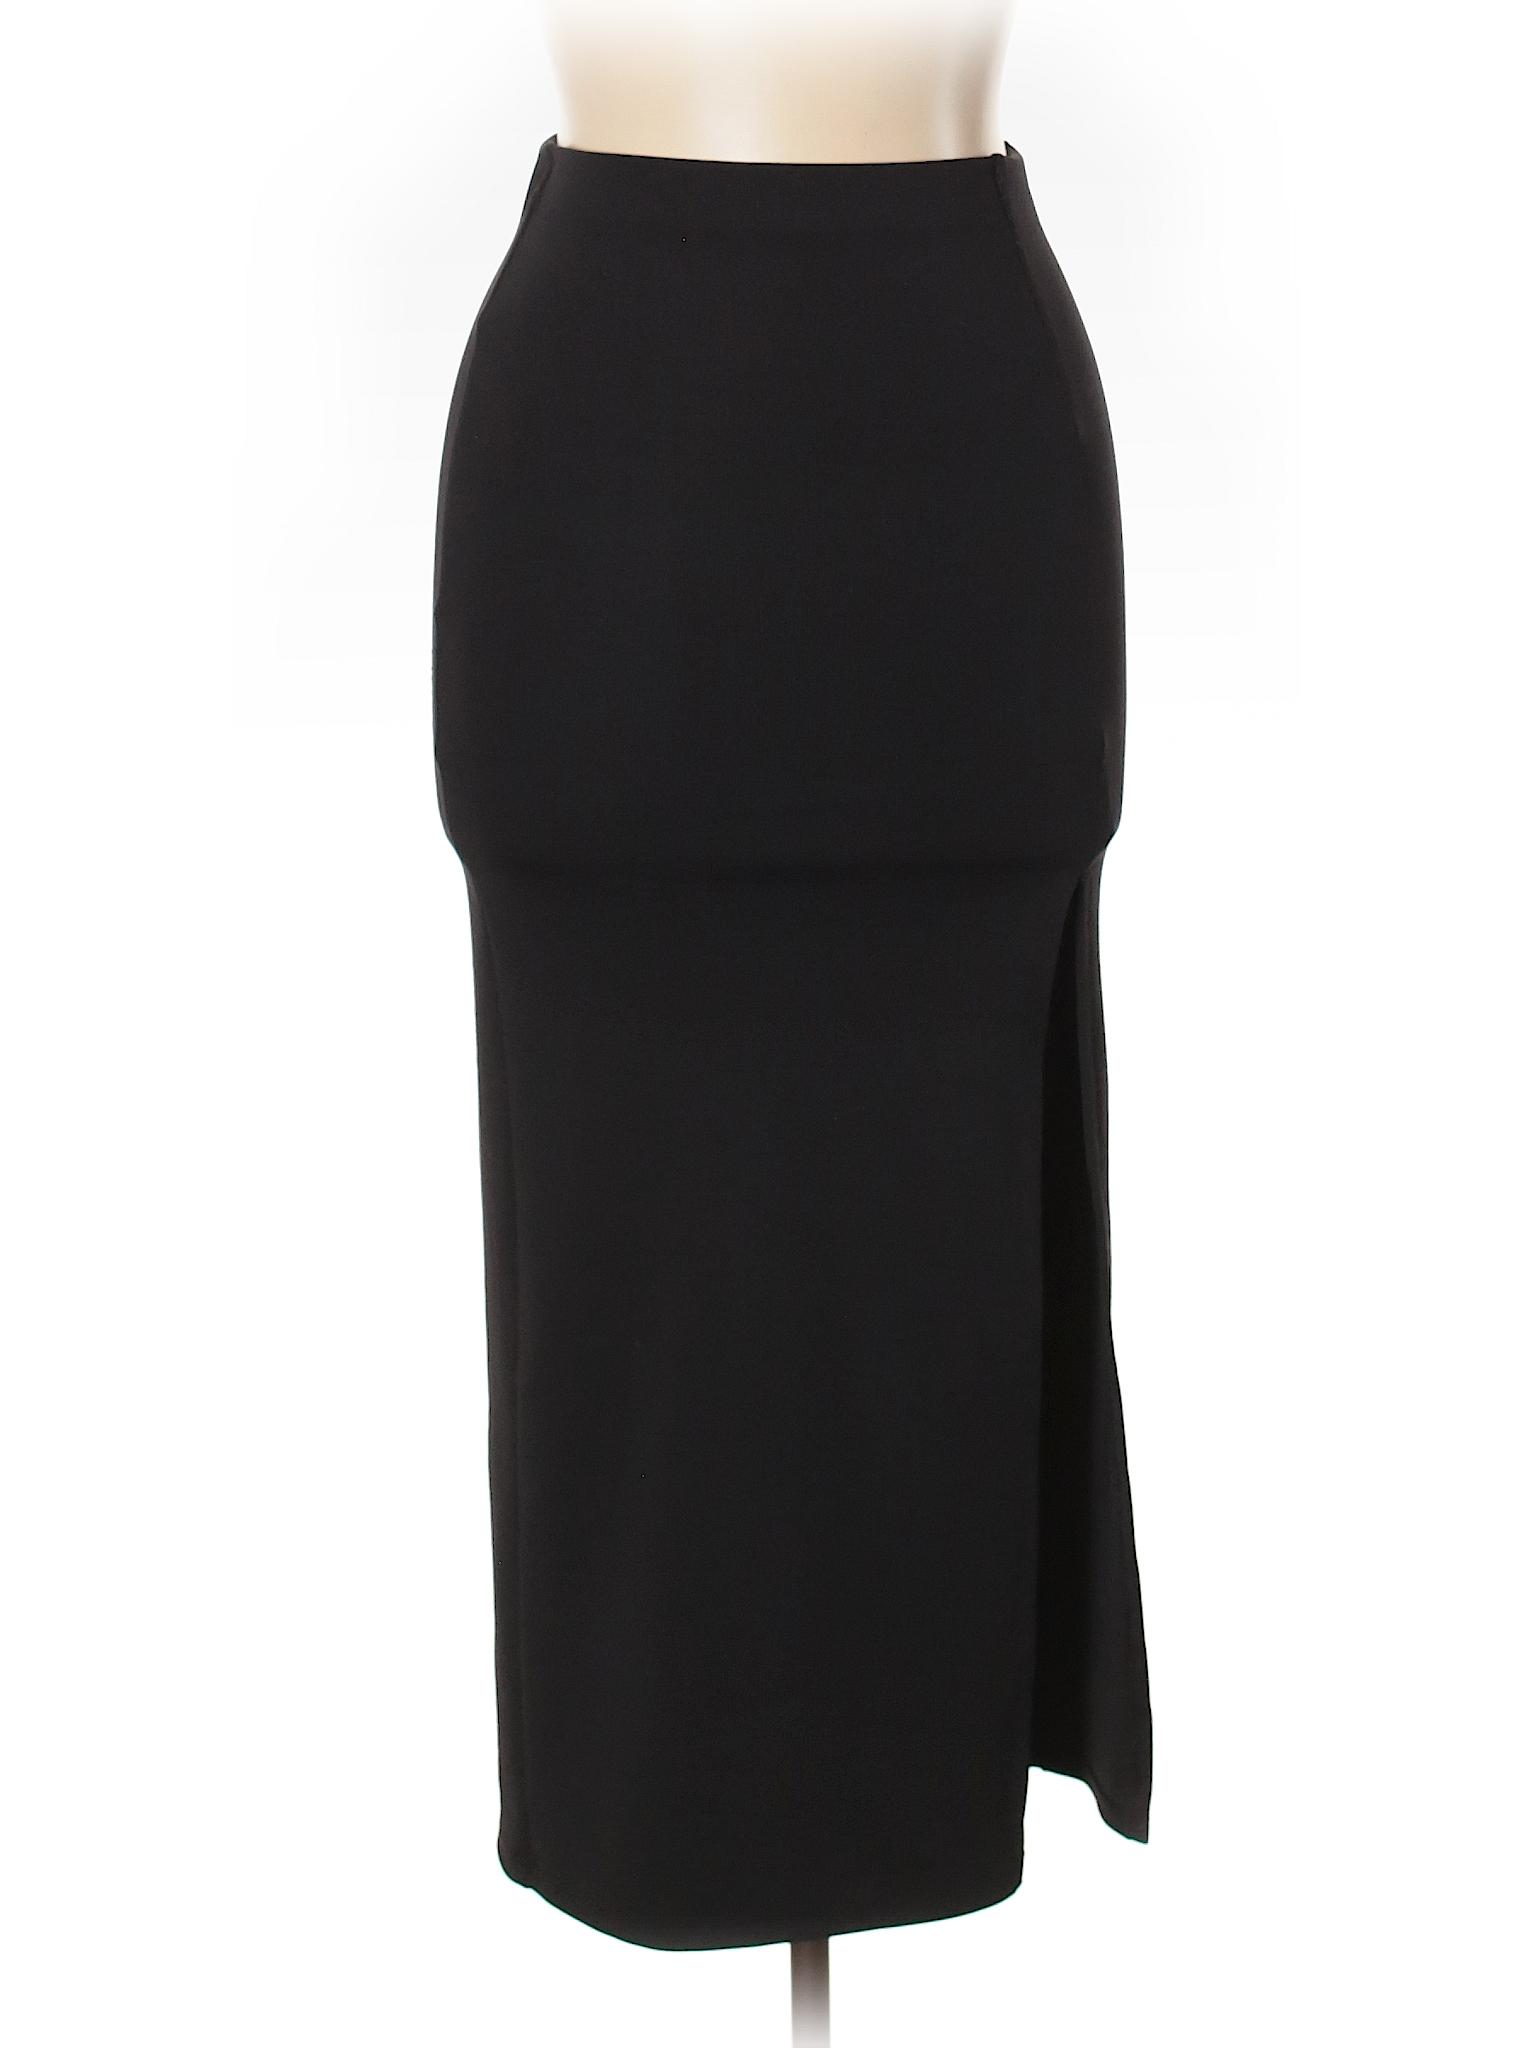 Boutique Skirt Boutique Boutique Casual Casual Casual Skirt Boutique Skirt Casual Skirt Boutique Casual Boutique Skirt Bz5XW1